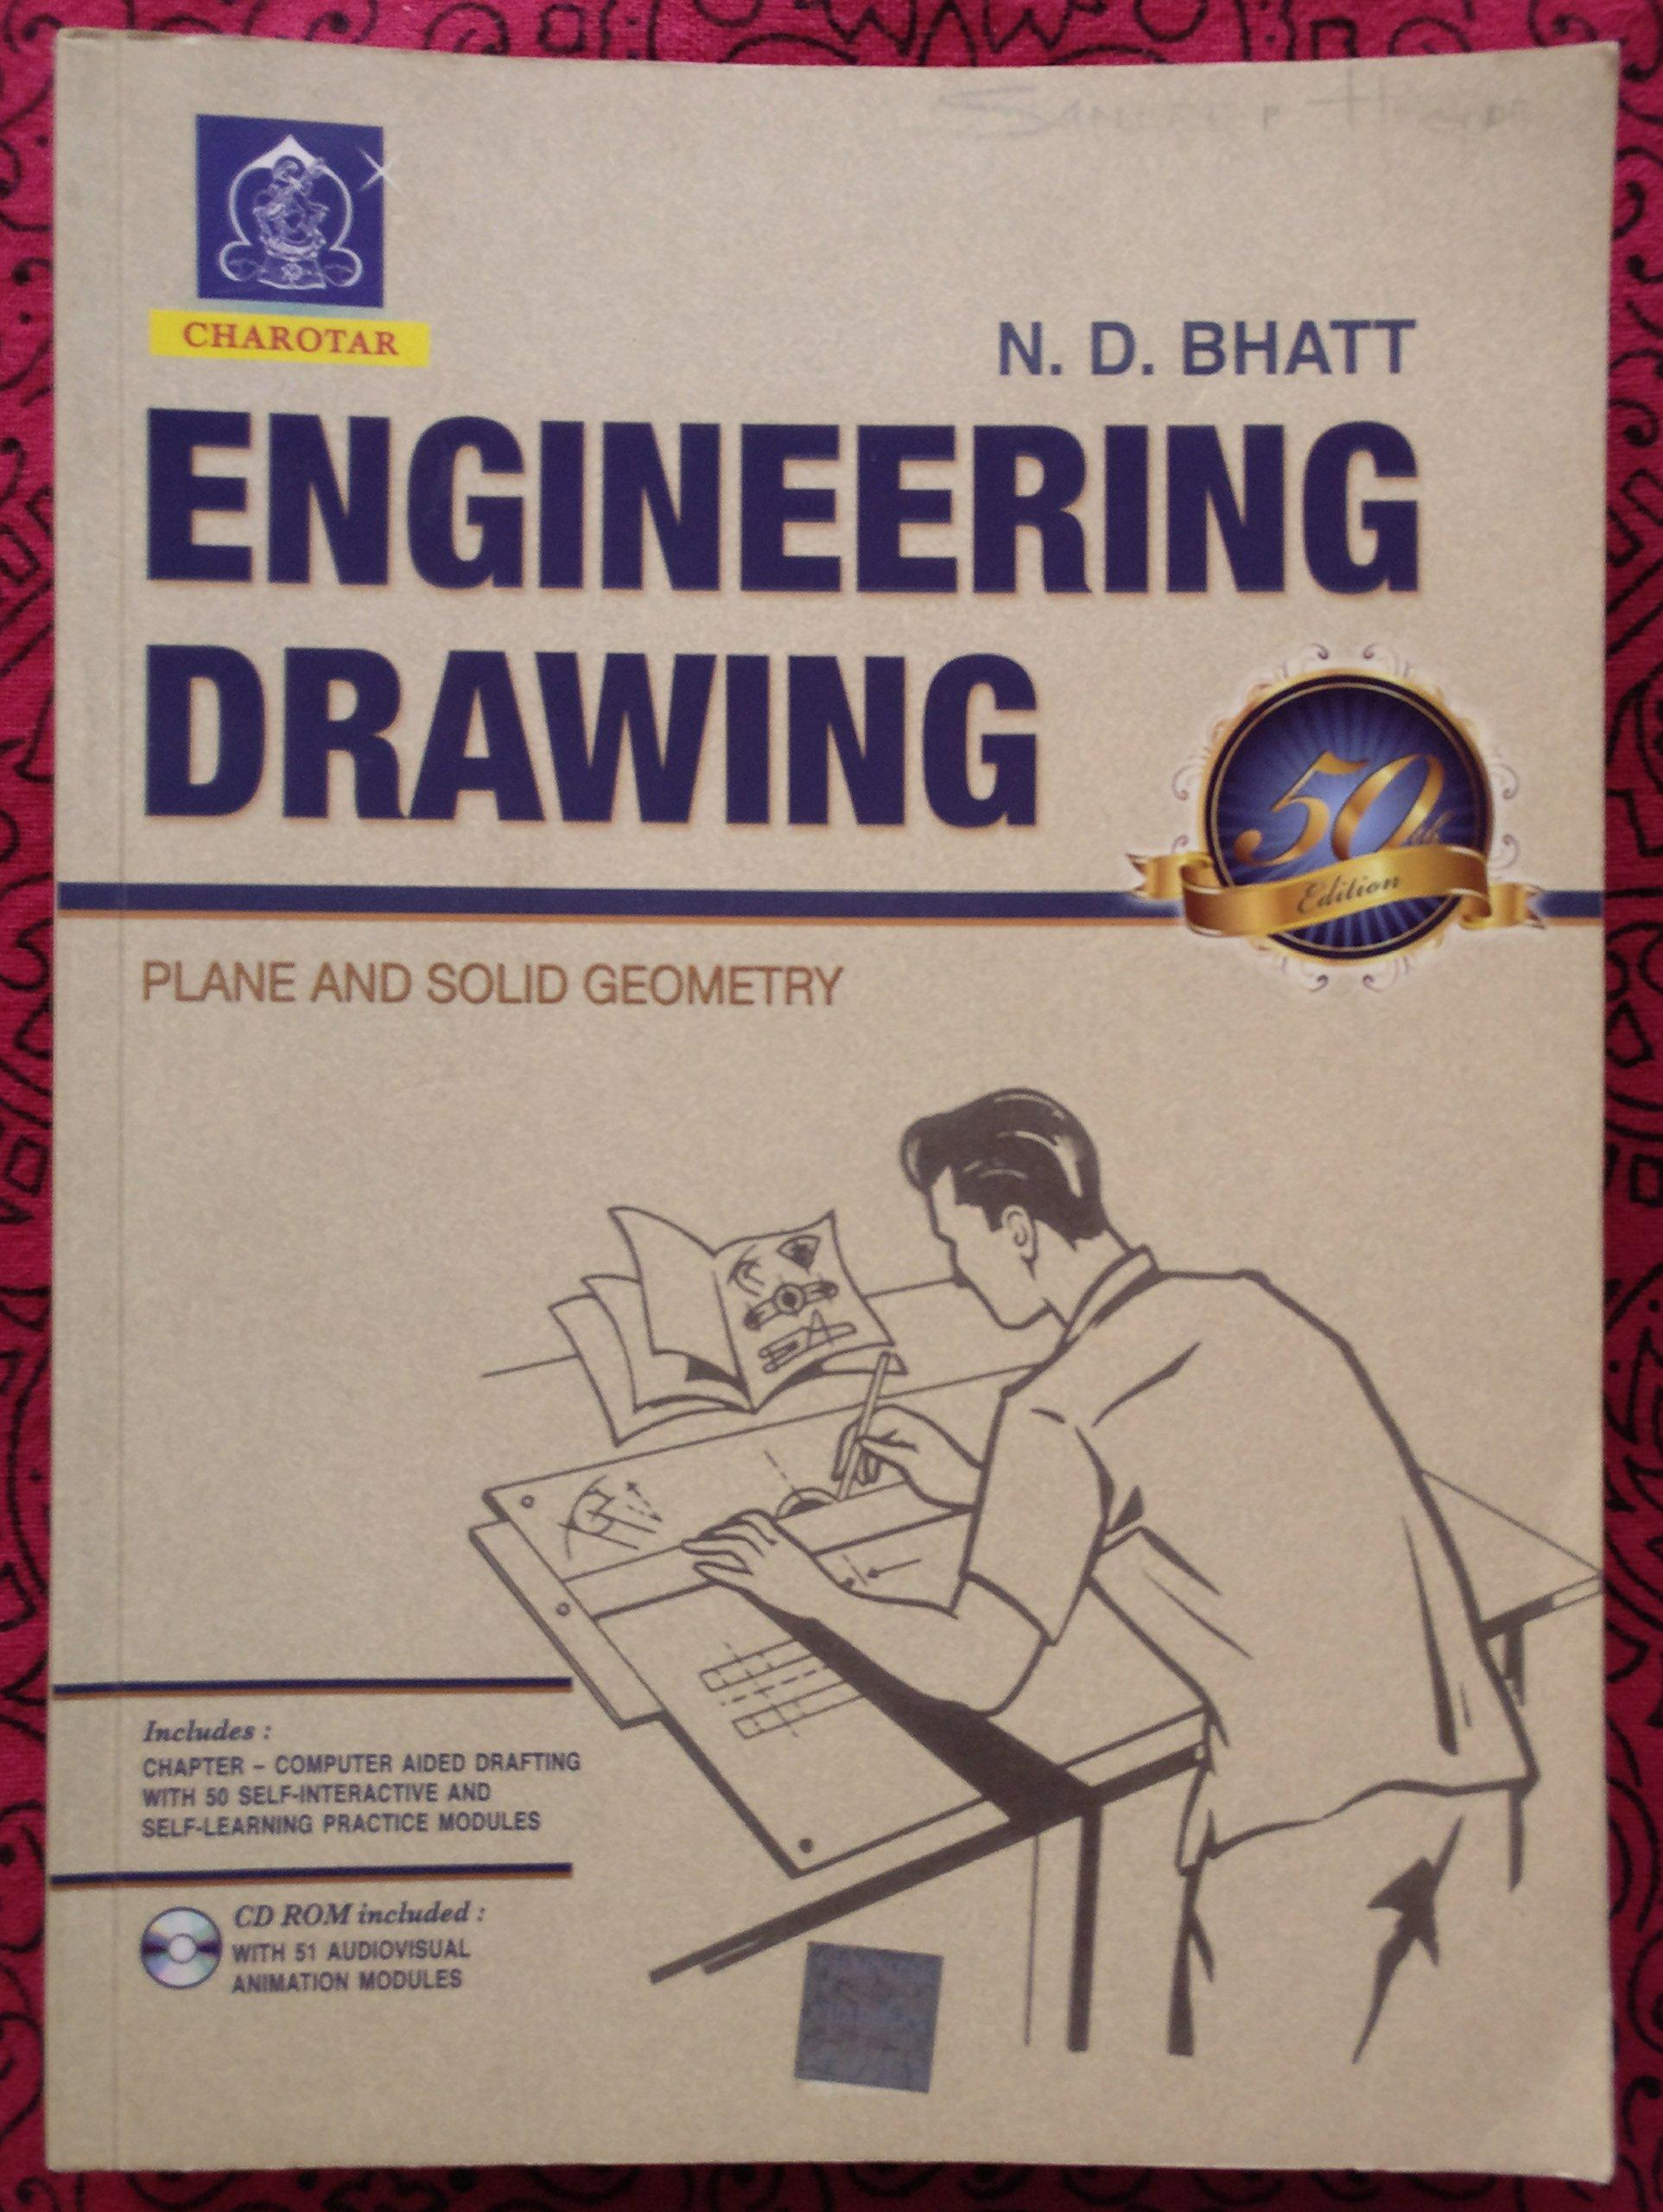 Engineering Drawing 53rd Edition 2014 Bhatt 9789380358963